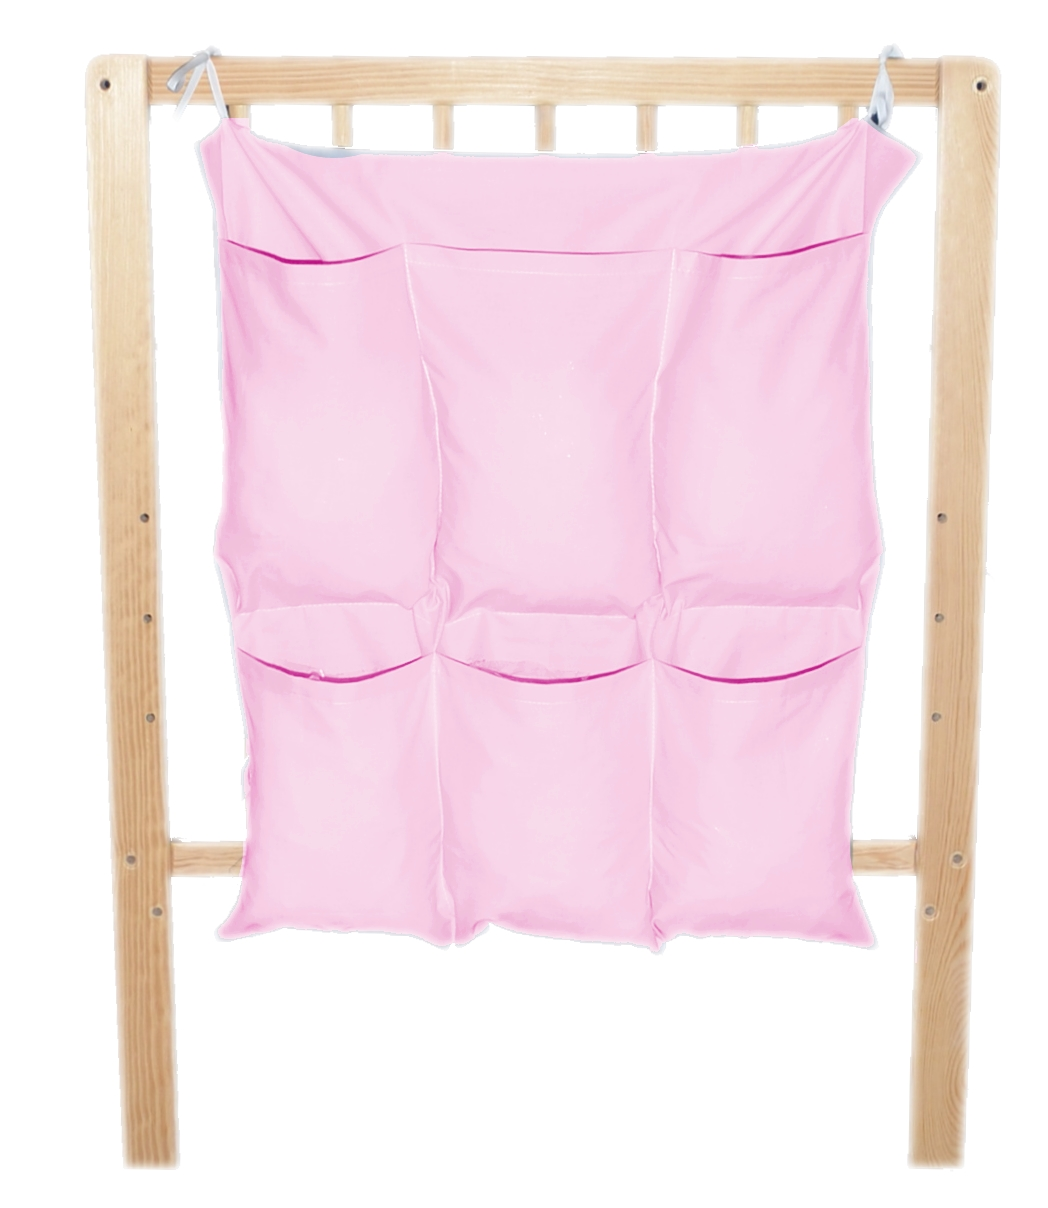 Bavlněný kapsář na postýlku - jednobarevný růžový (BB7)